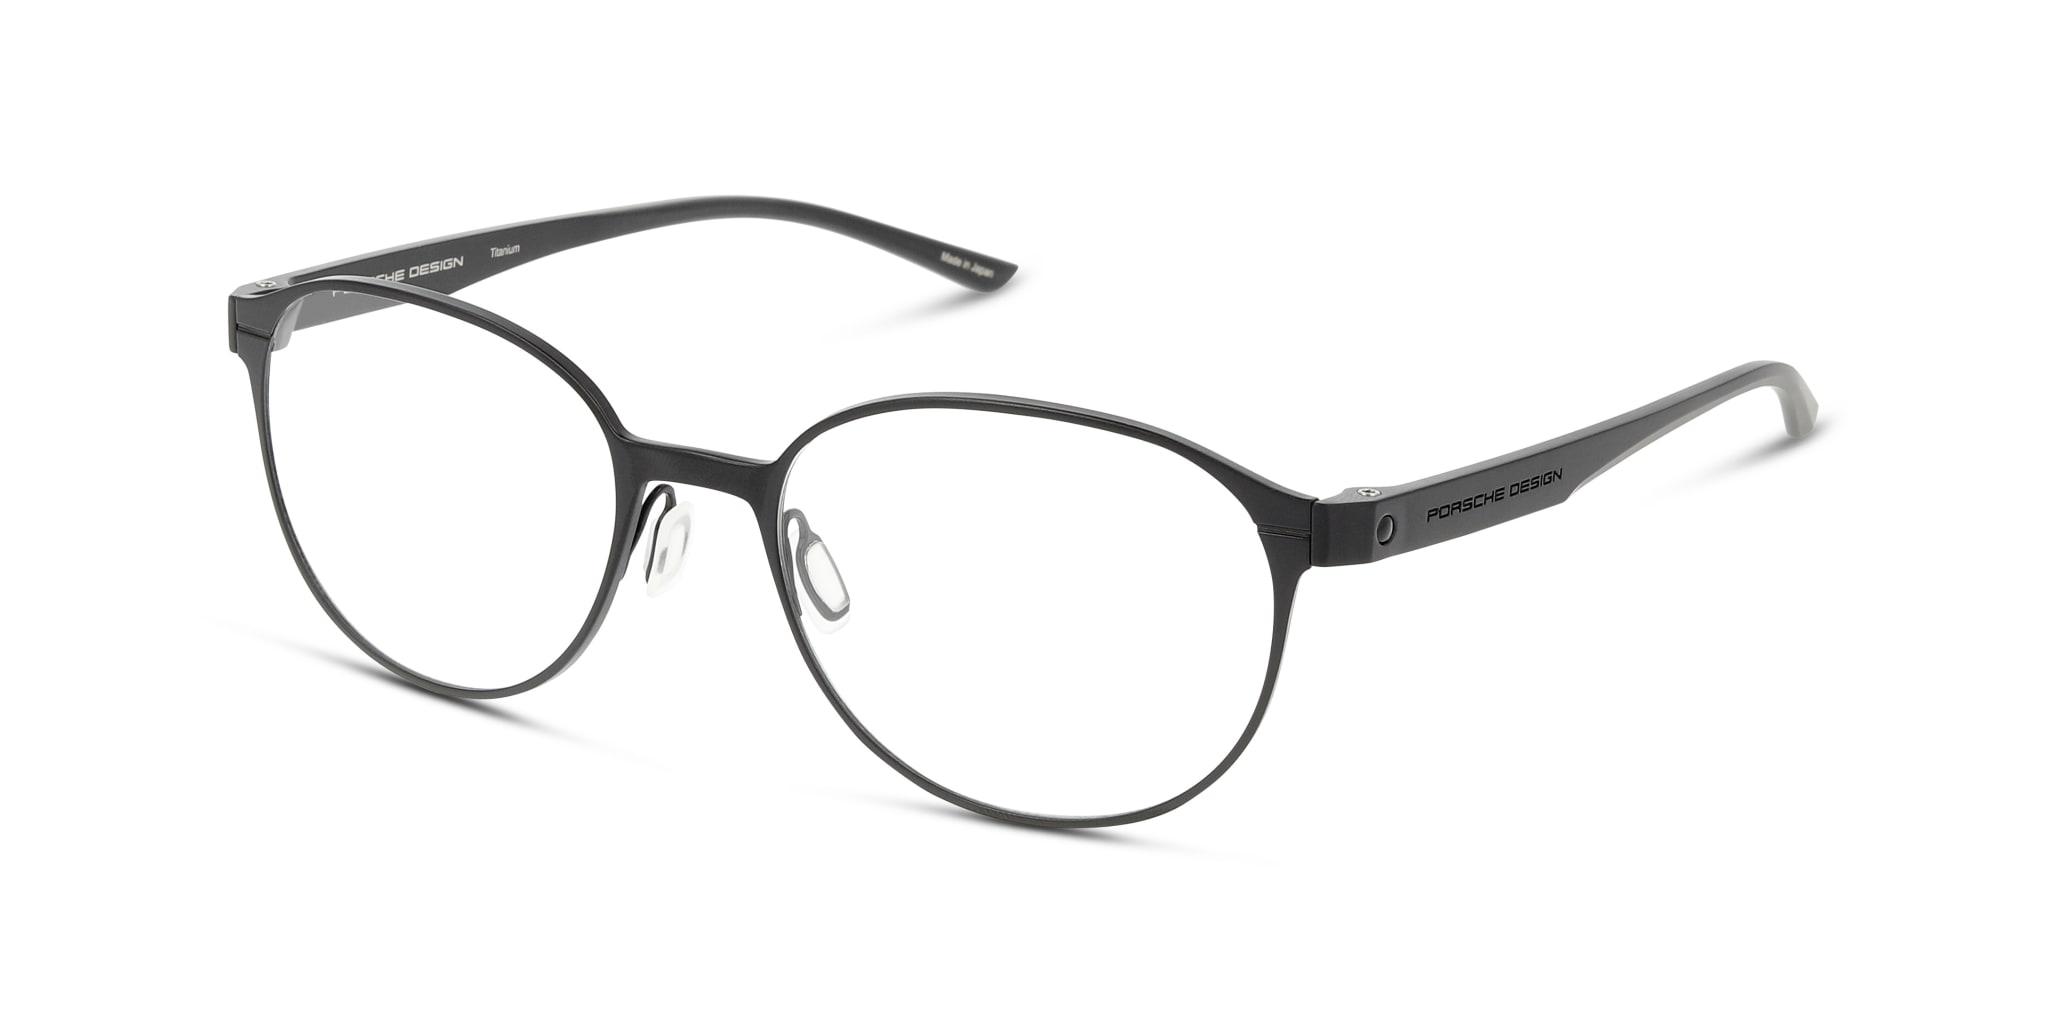 4046901034948-angle-03-porsche-design-p8345-eyewear-black